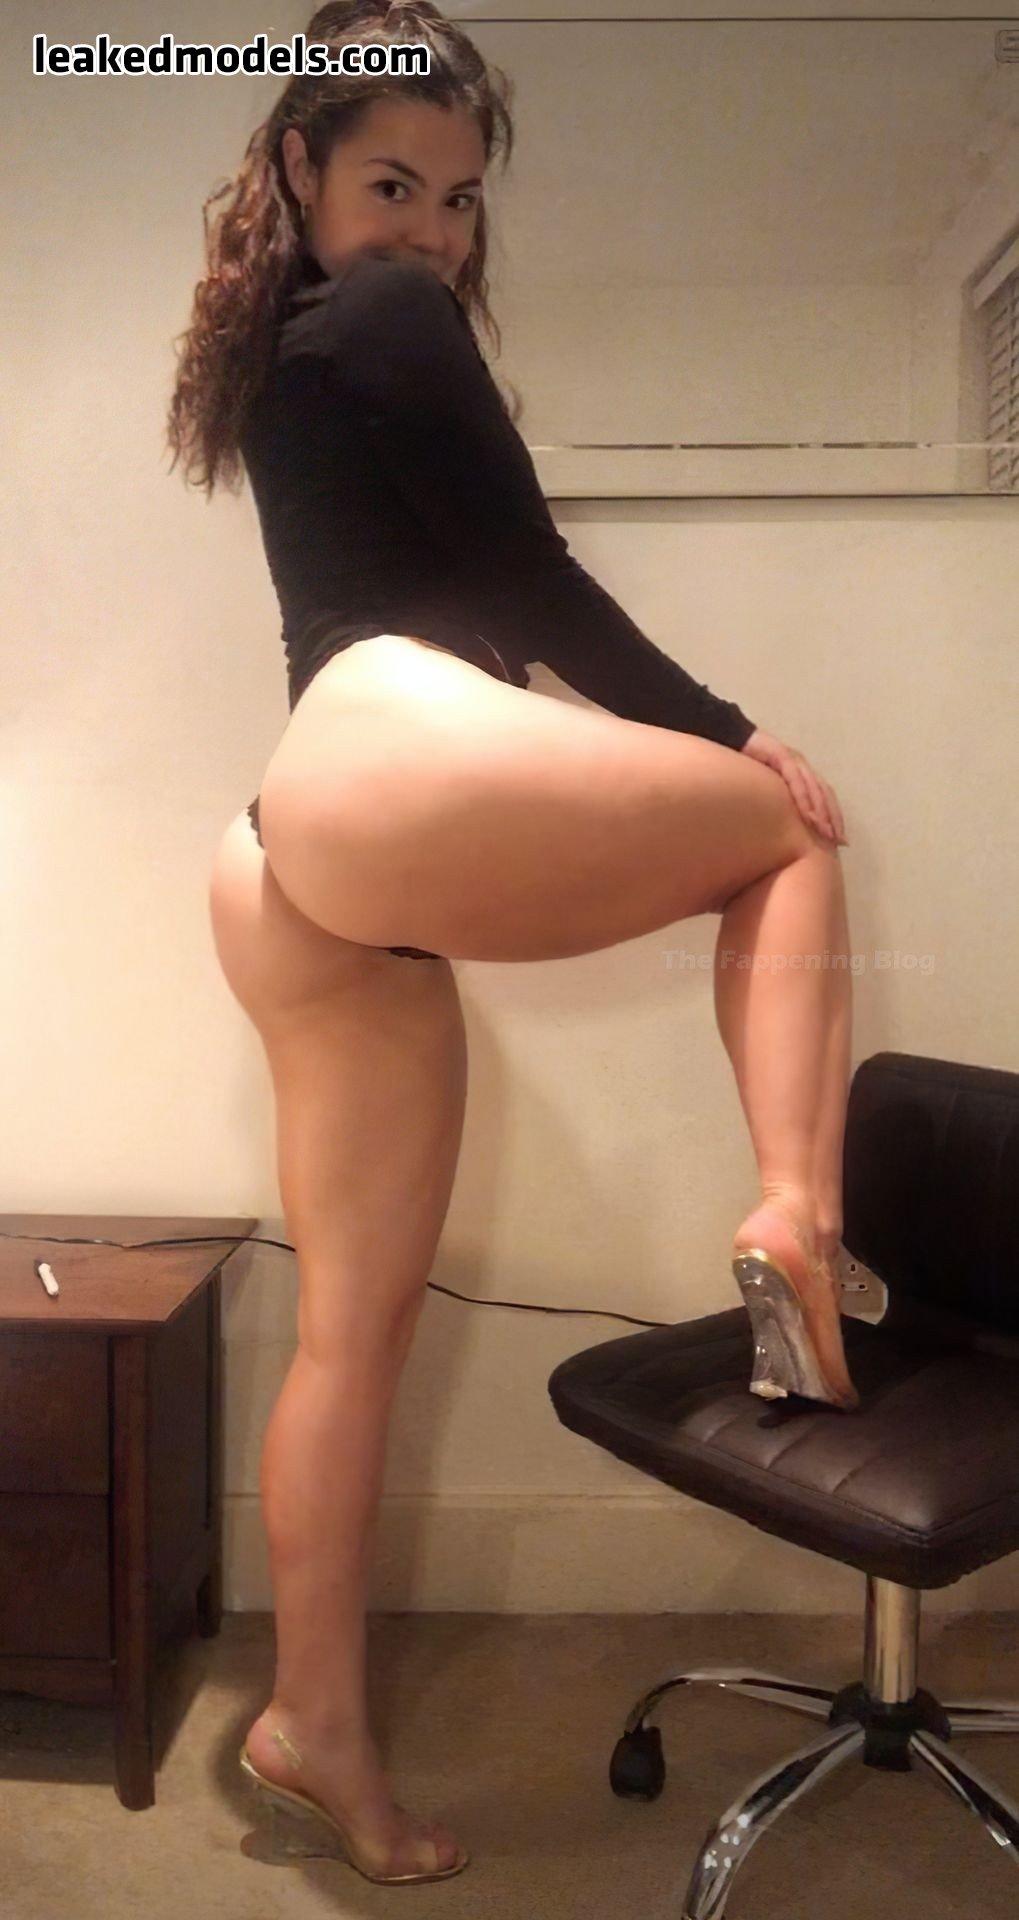 Megan Prescott aka Katie finch from skins uk OnlyFans Nude Leaks (25 Photos)